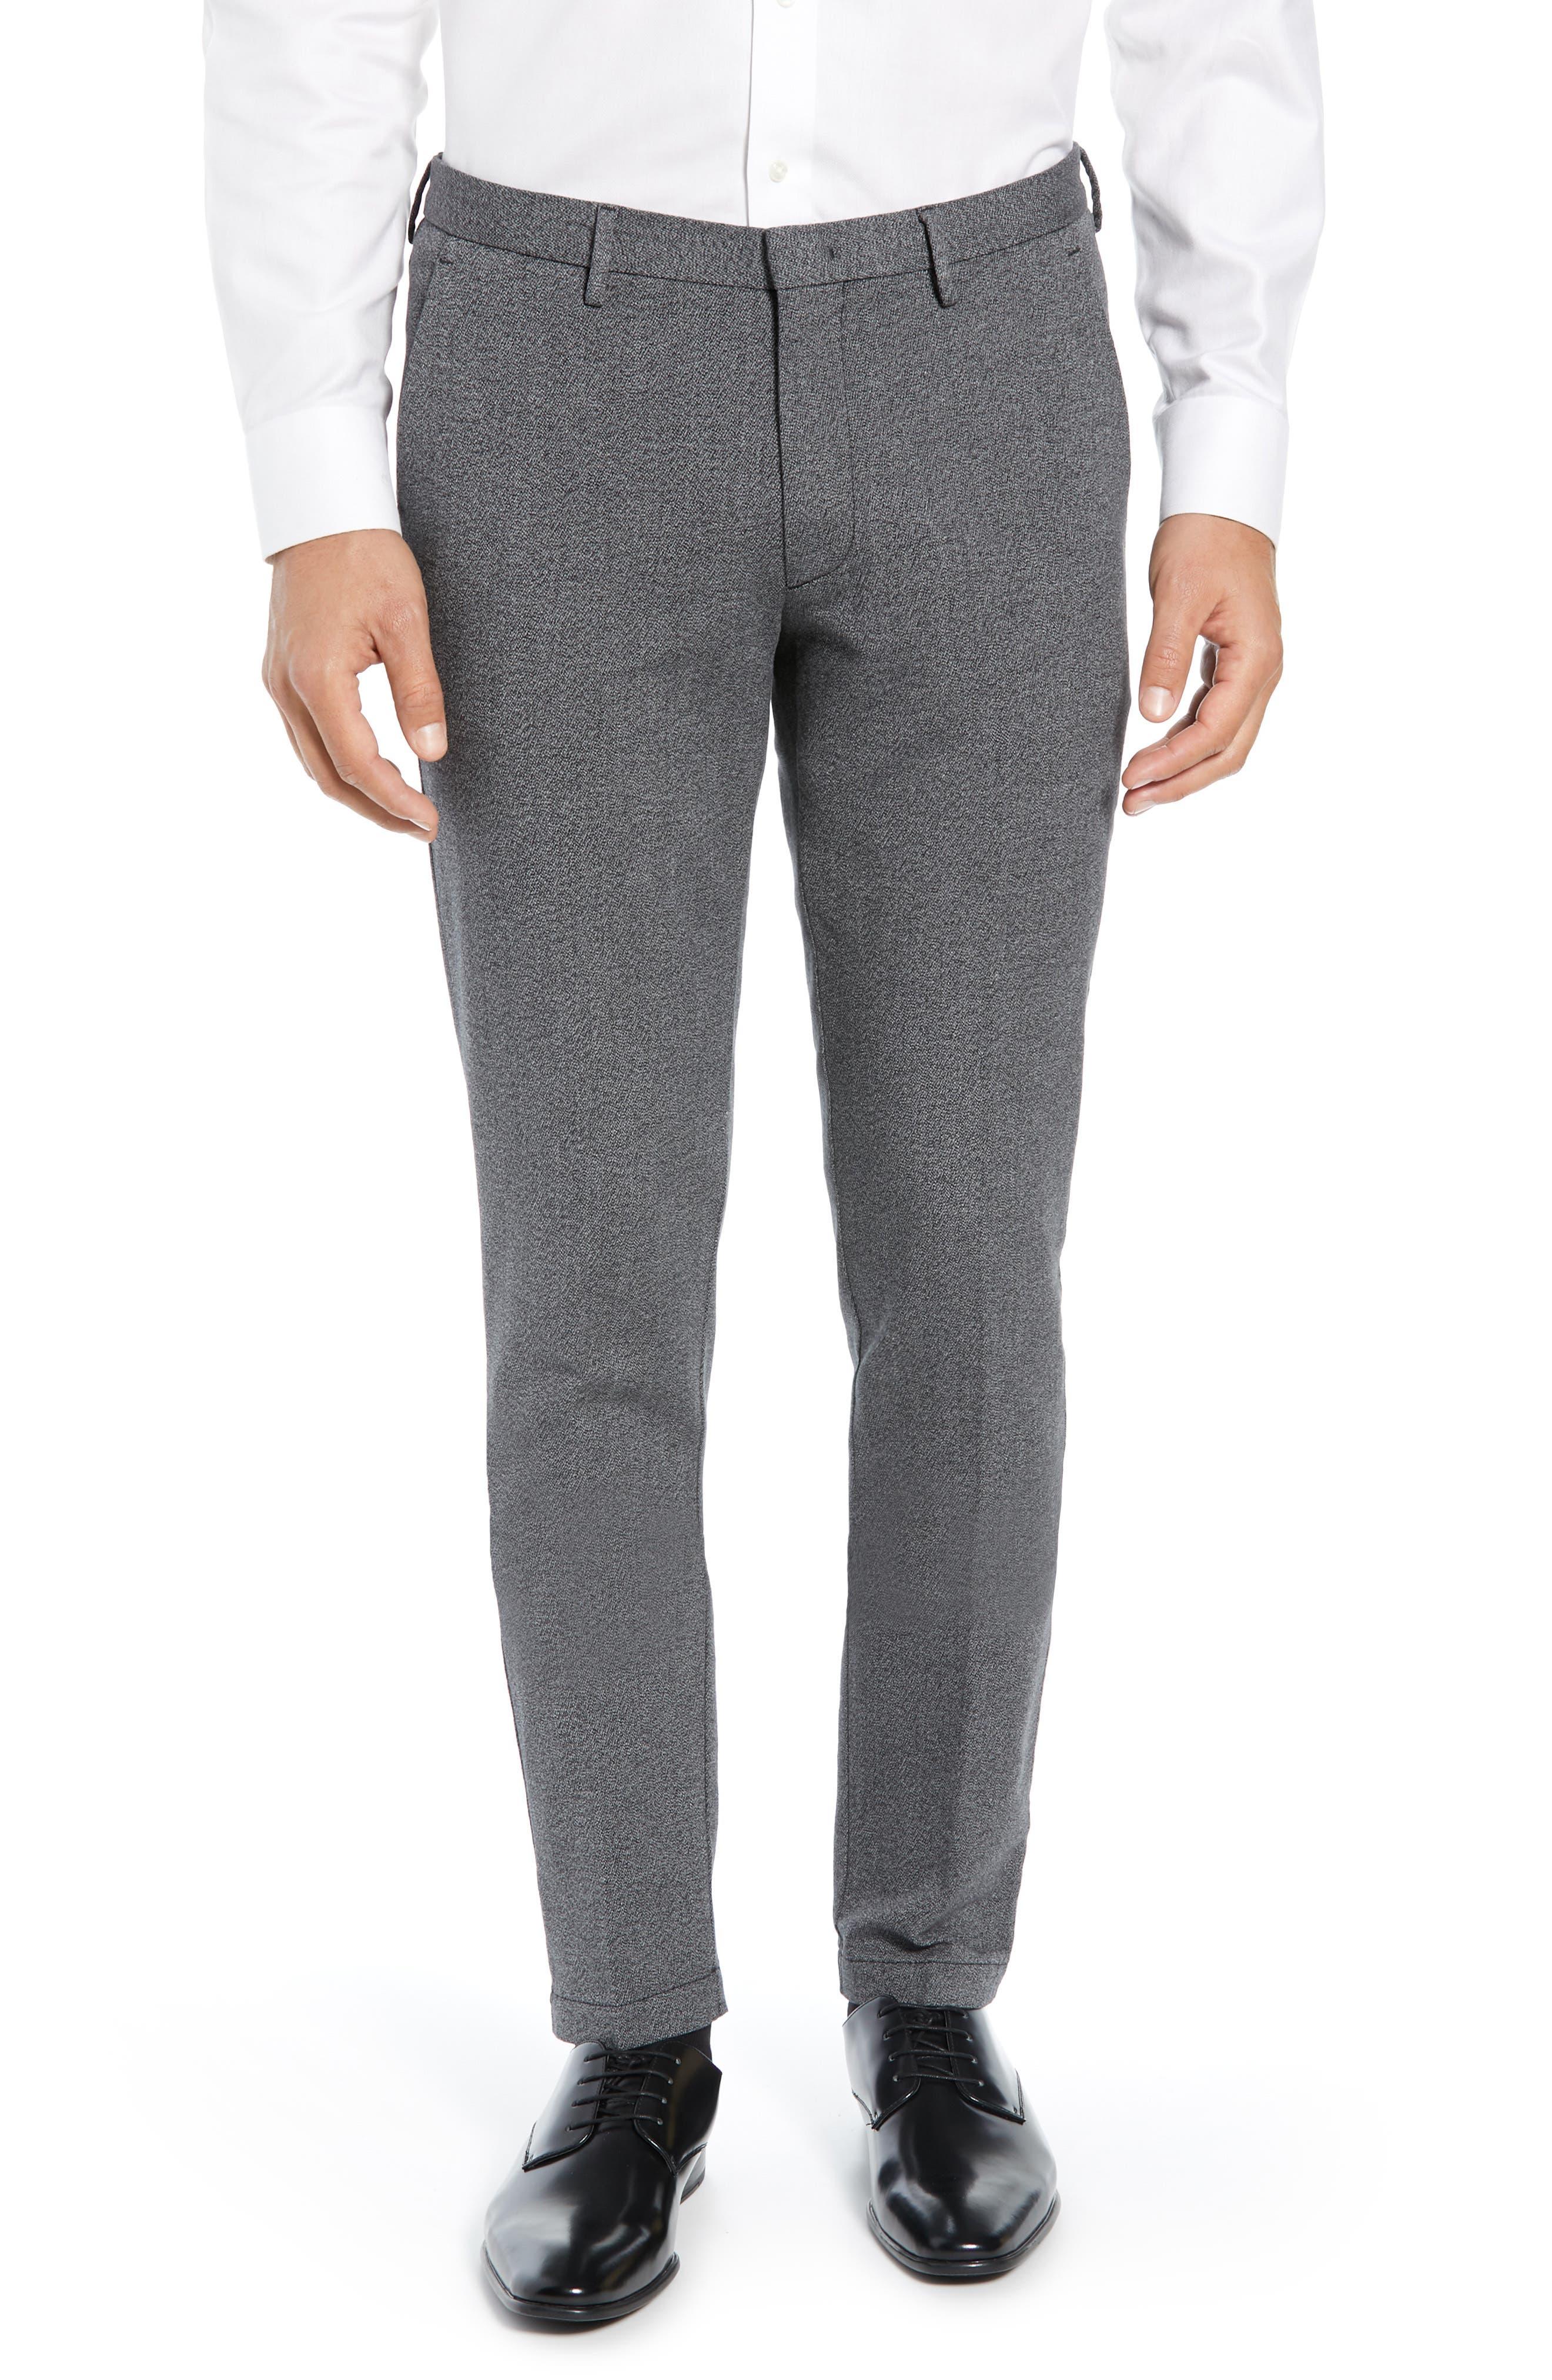 Kaito Slim Fit Twill Trousers,                             Main thumbnail 1, color,                             BLACK